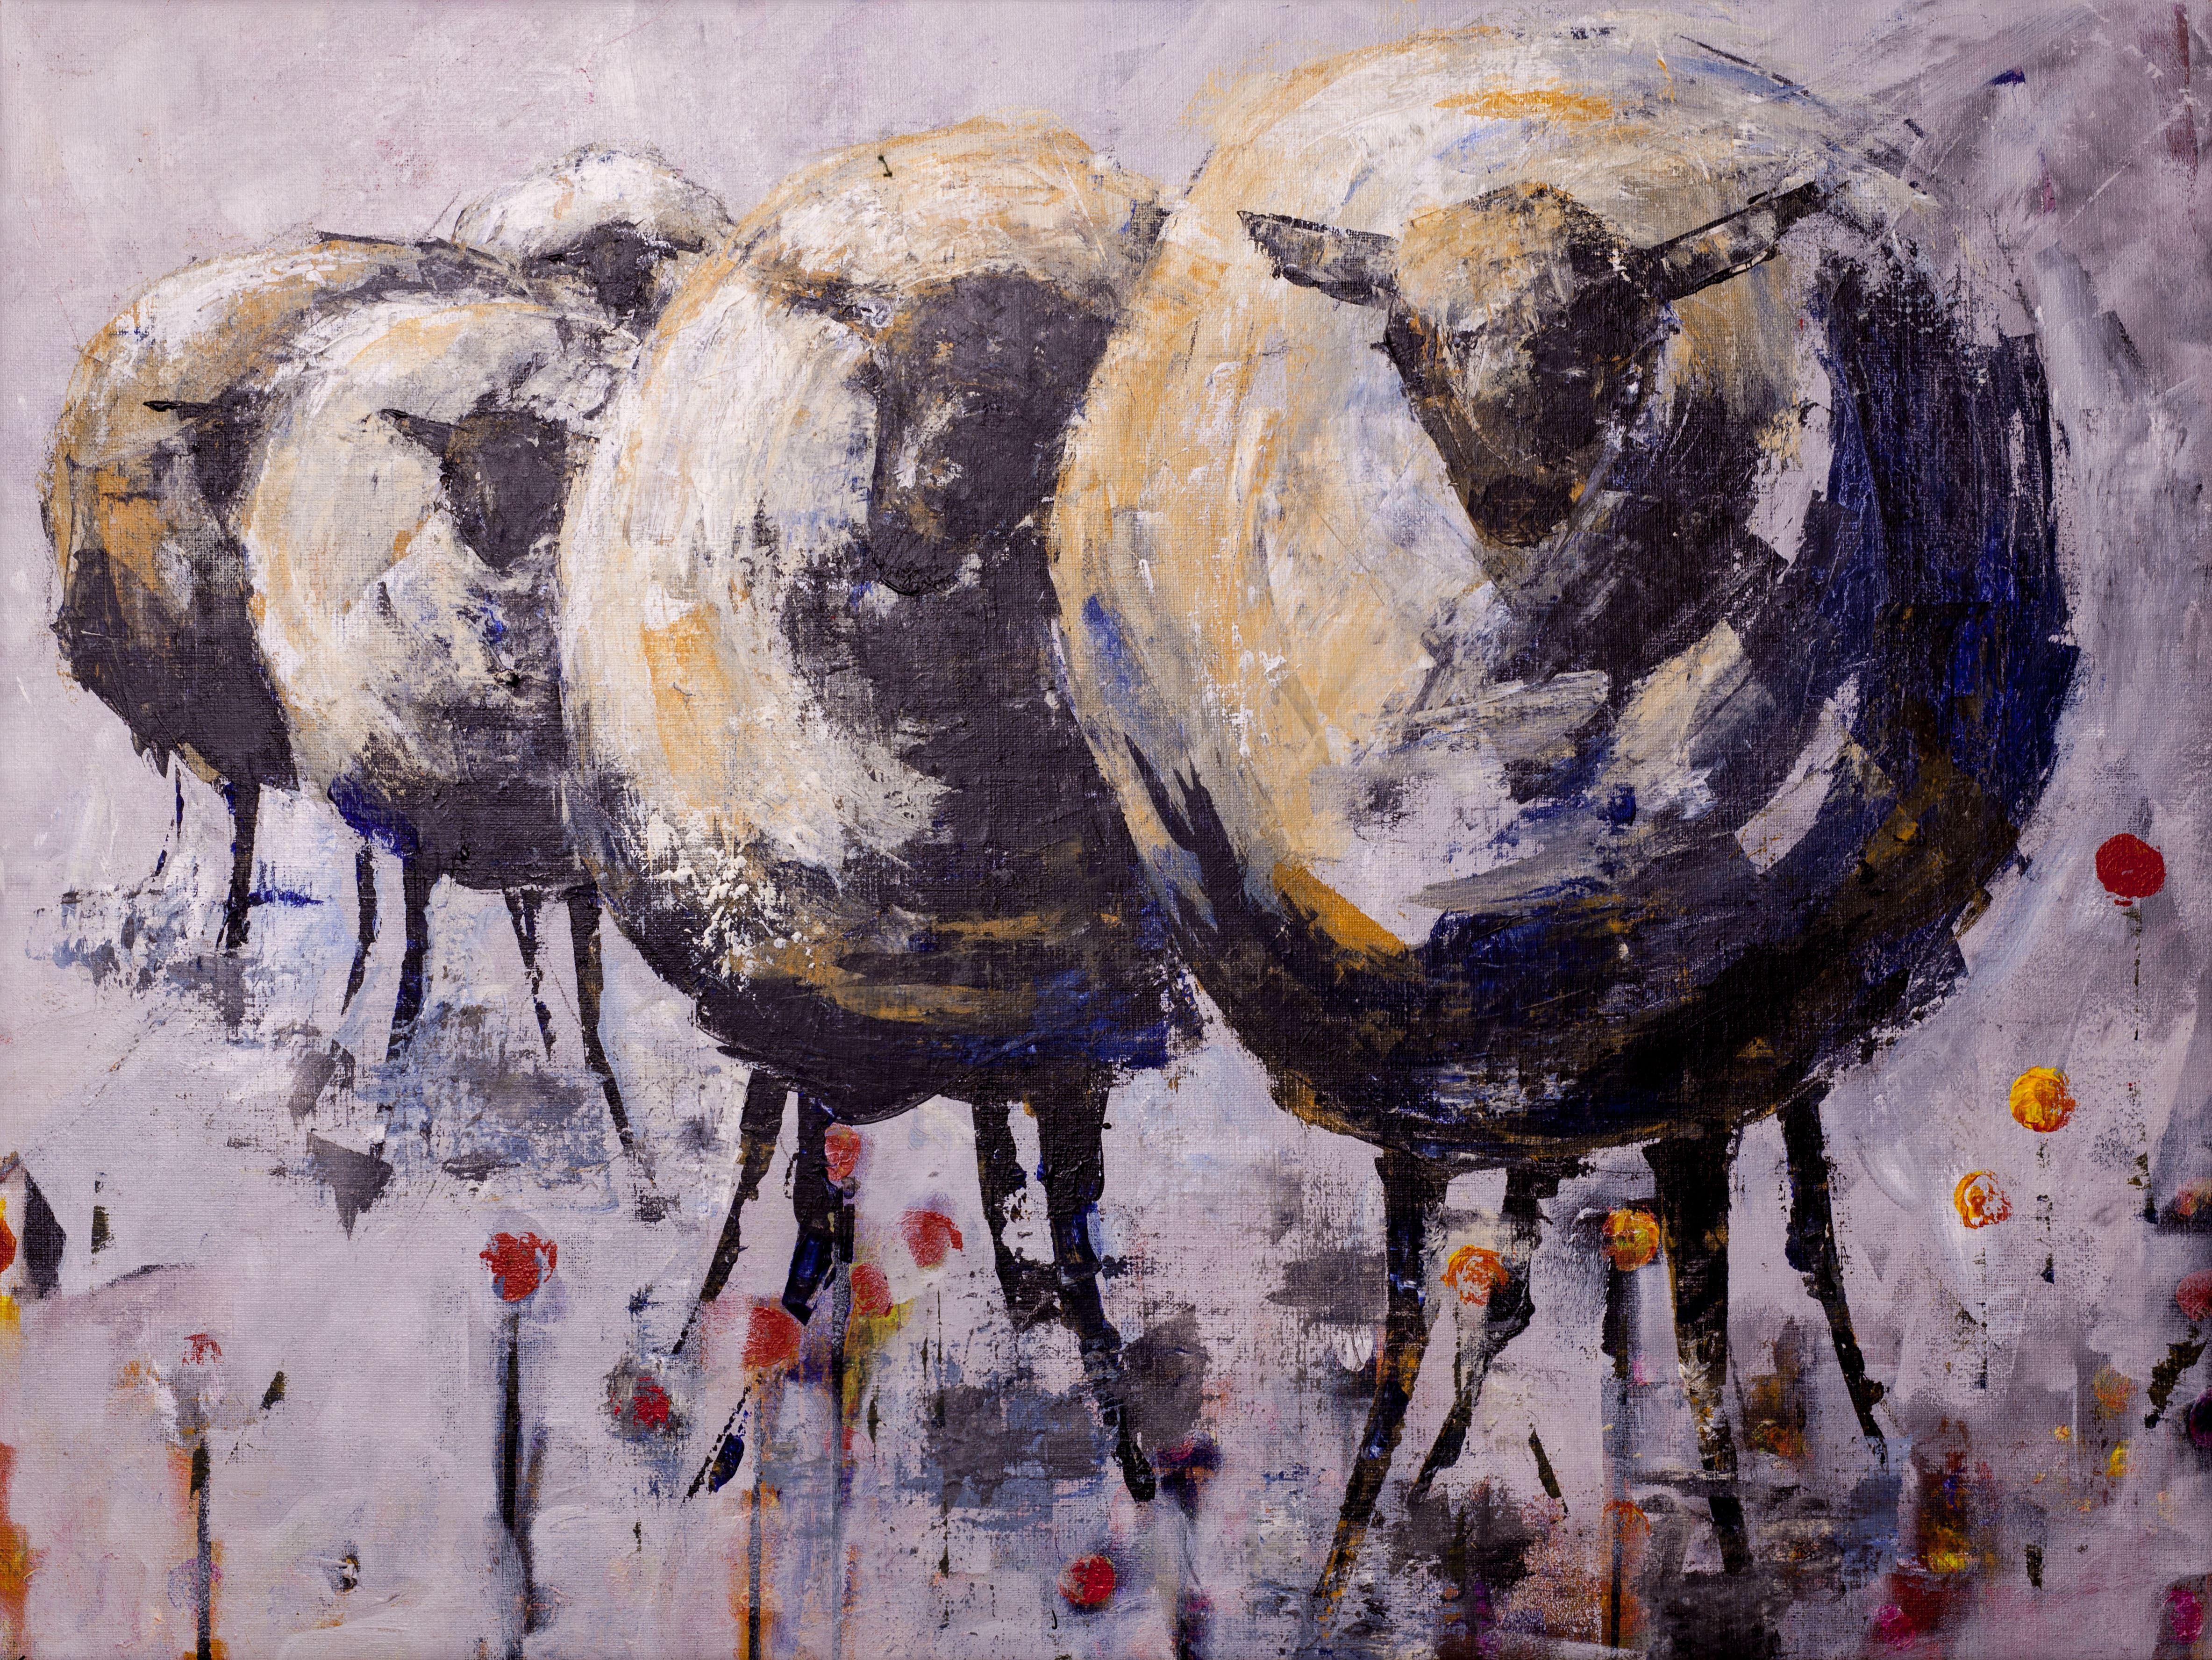 Ateljé Valhall - Ritha Holst